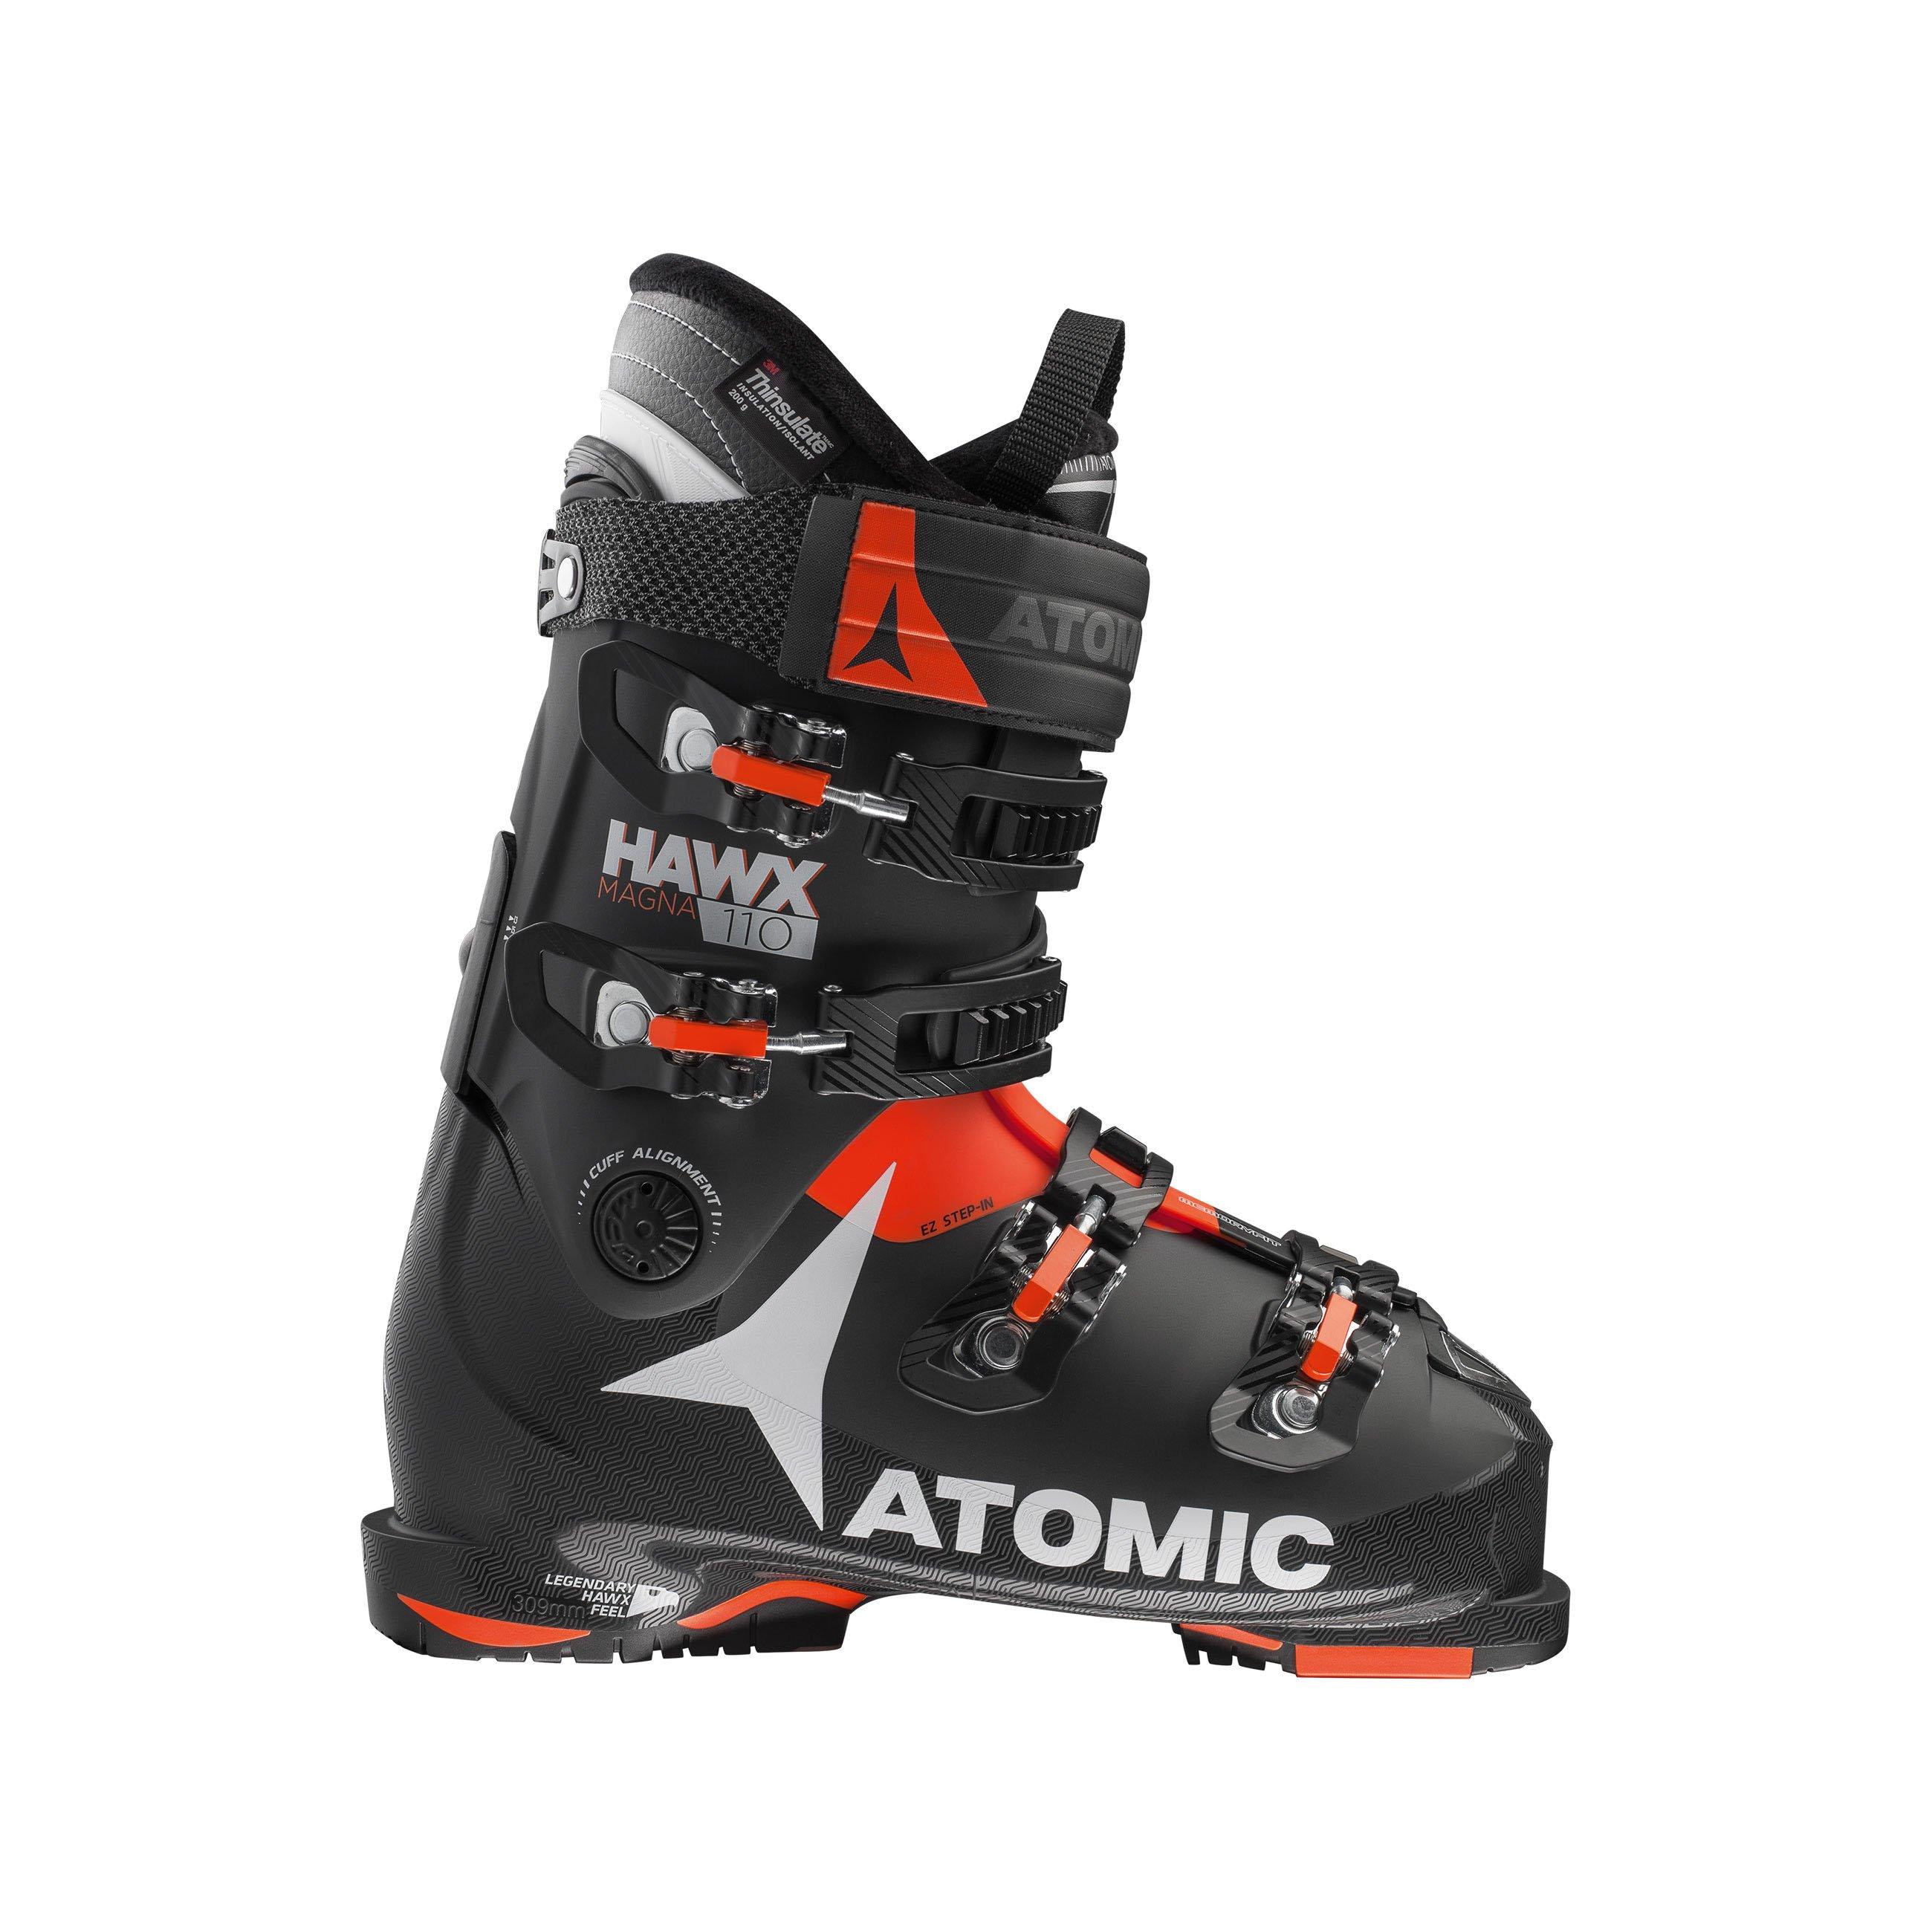 Atomic Hawx Magna 110 16/17